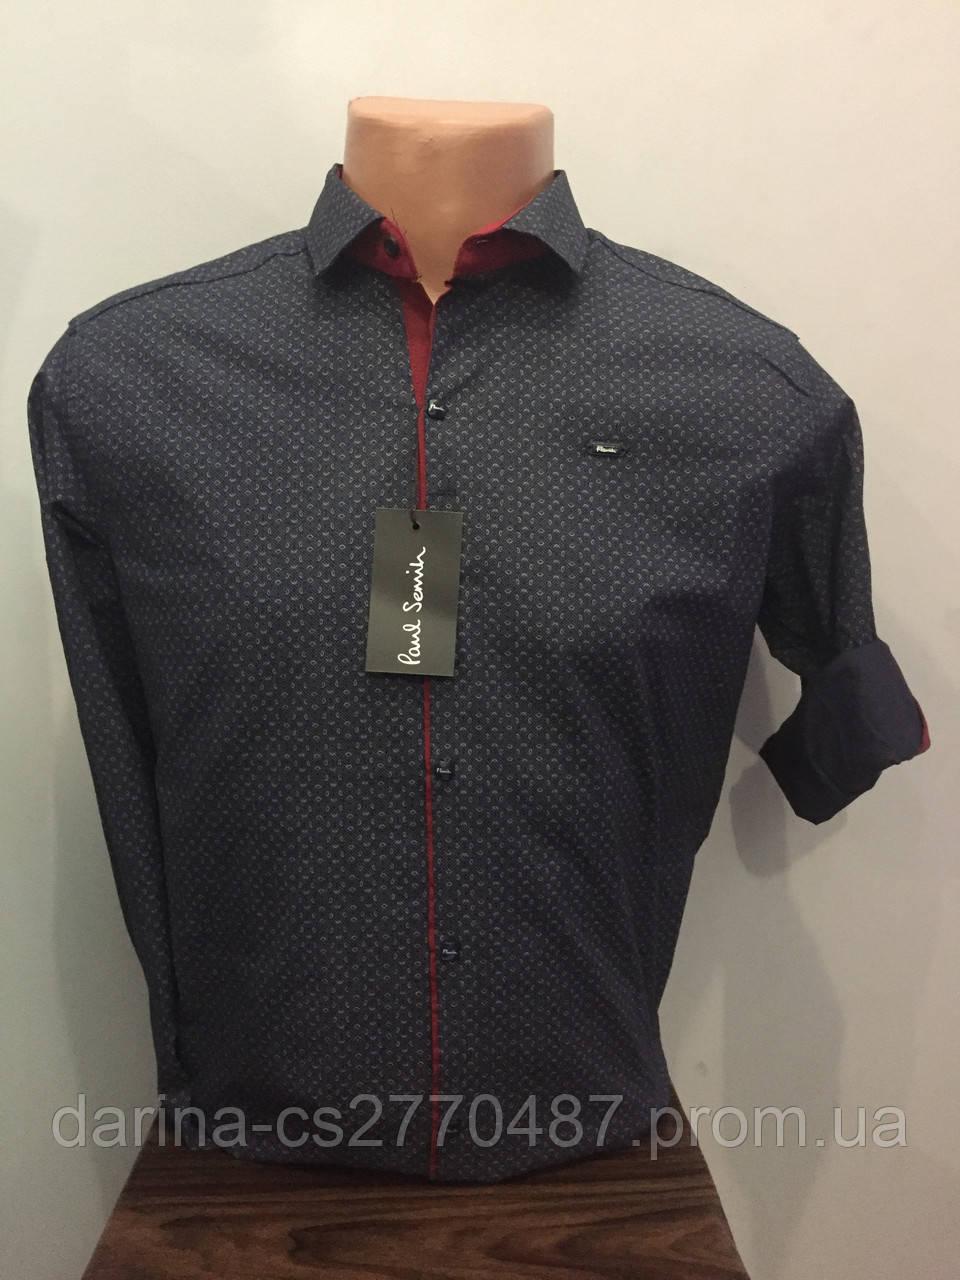 Турецкая рубашка для мужчины S